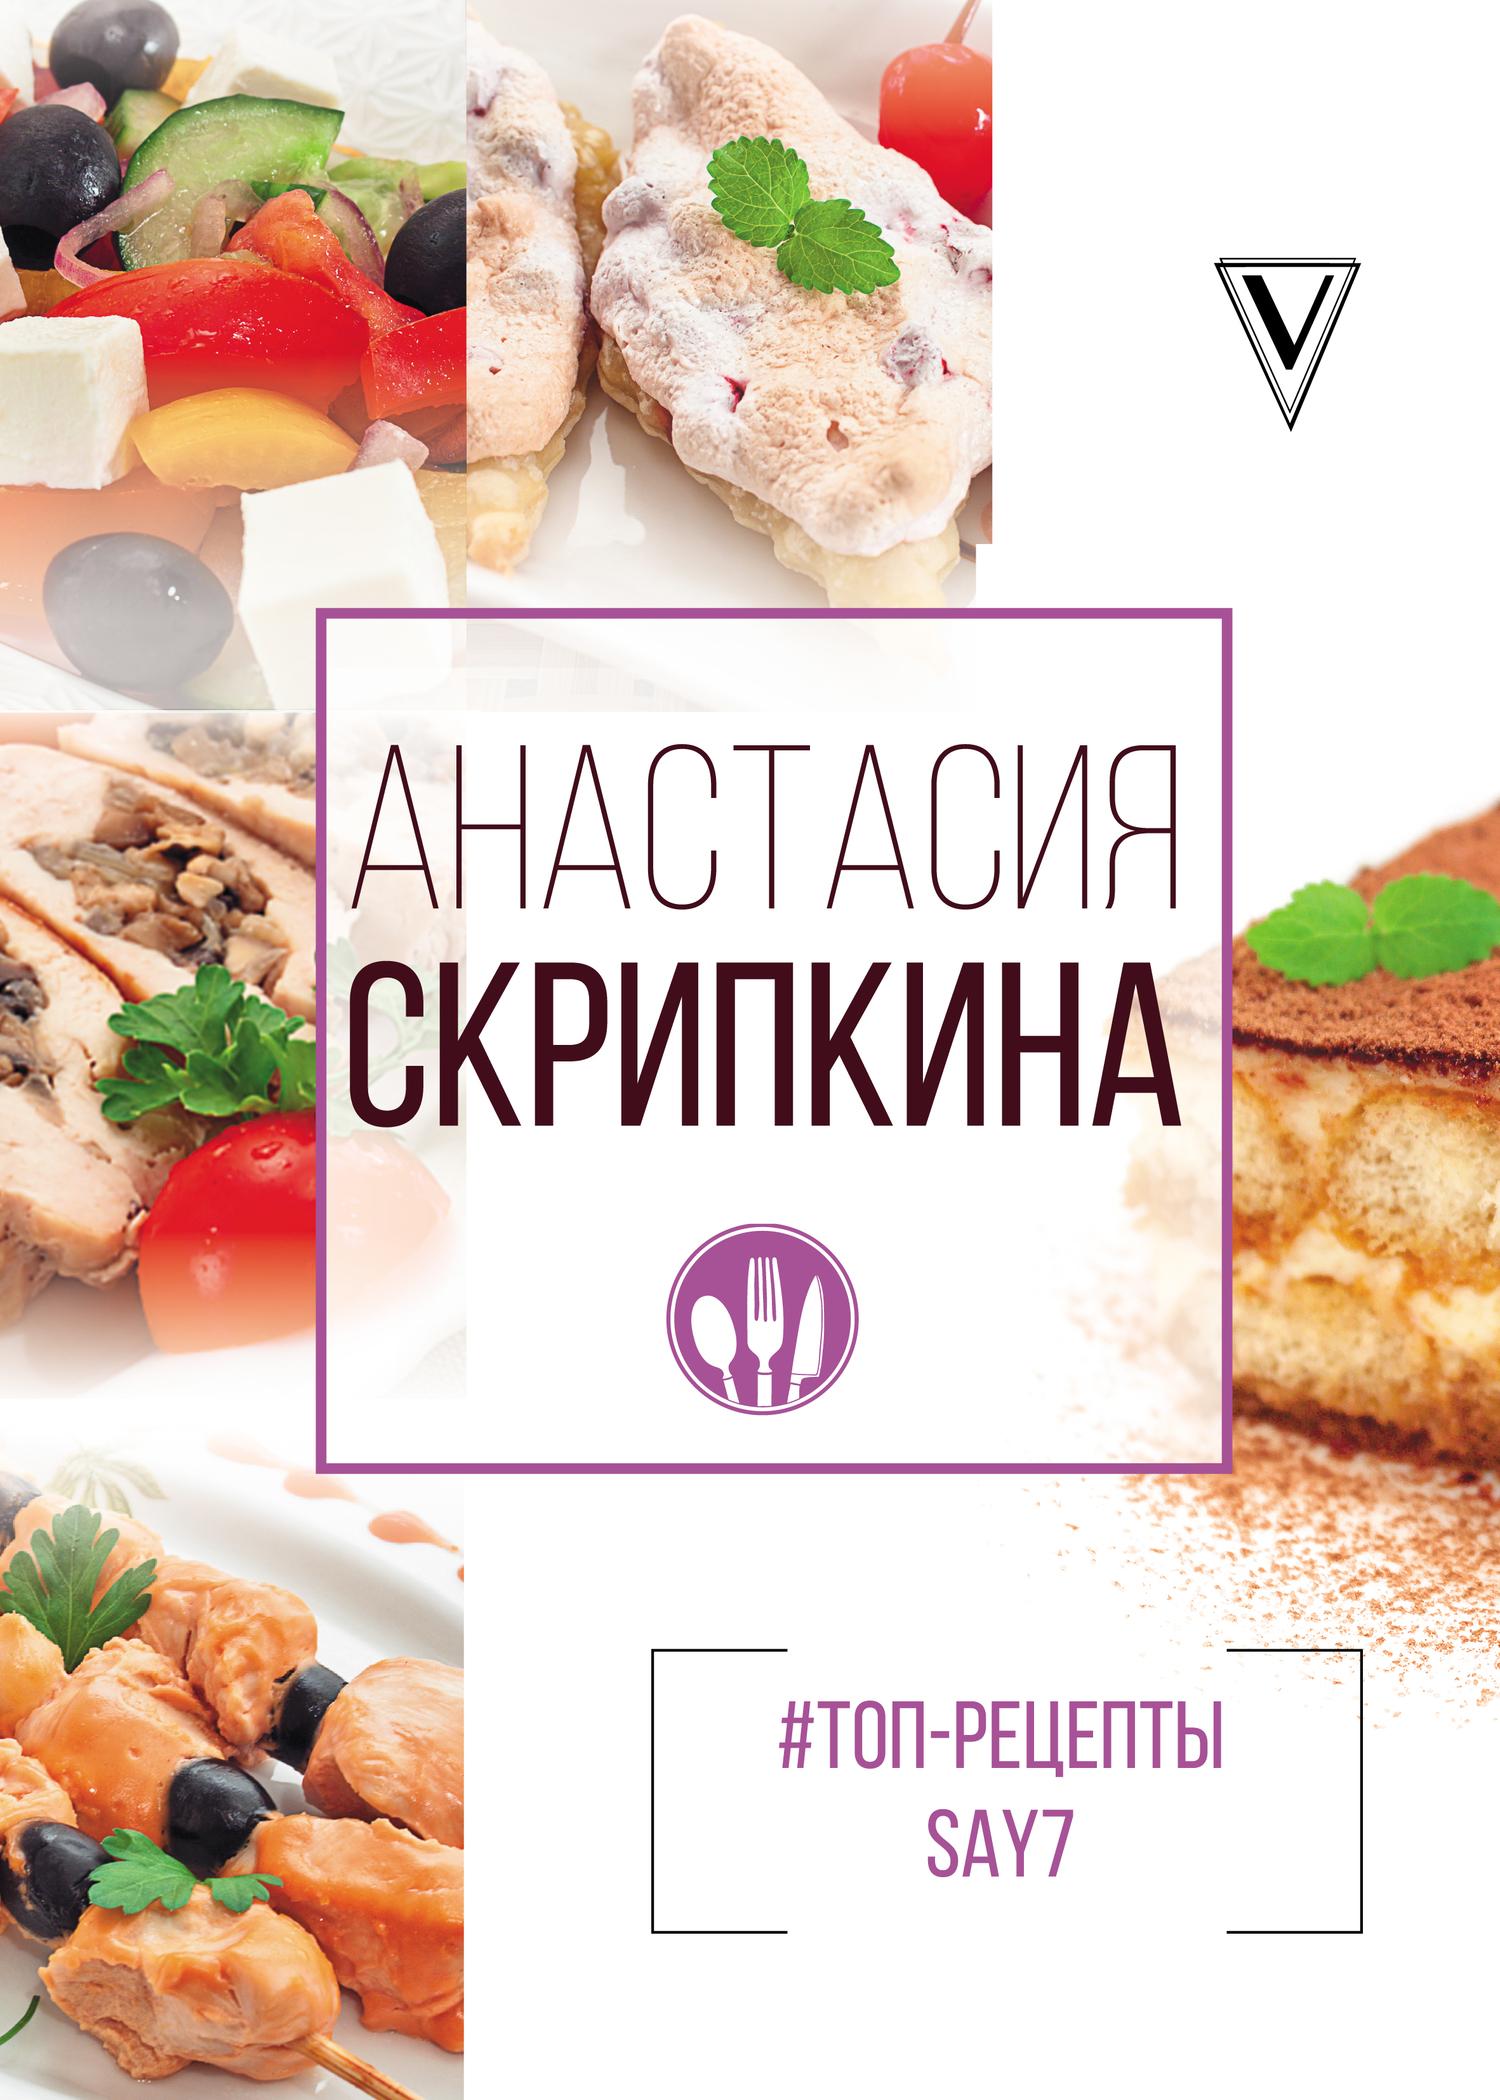 #Топ-рецепты say7